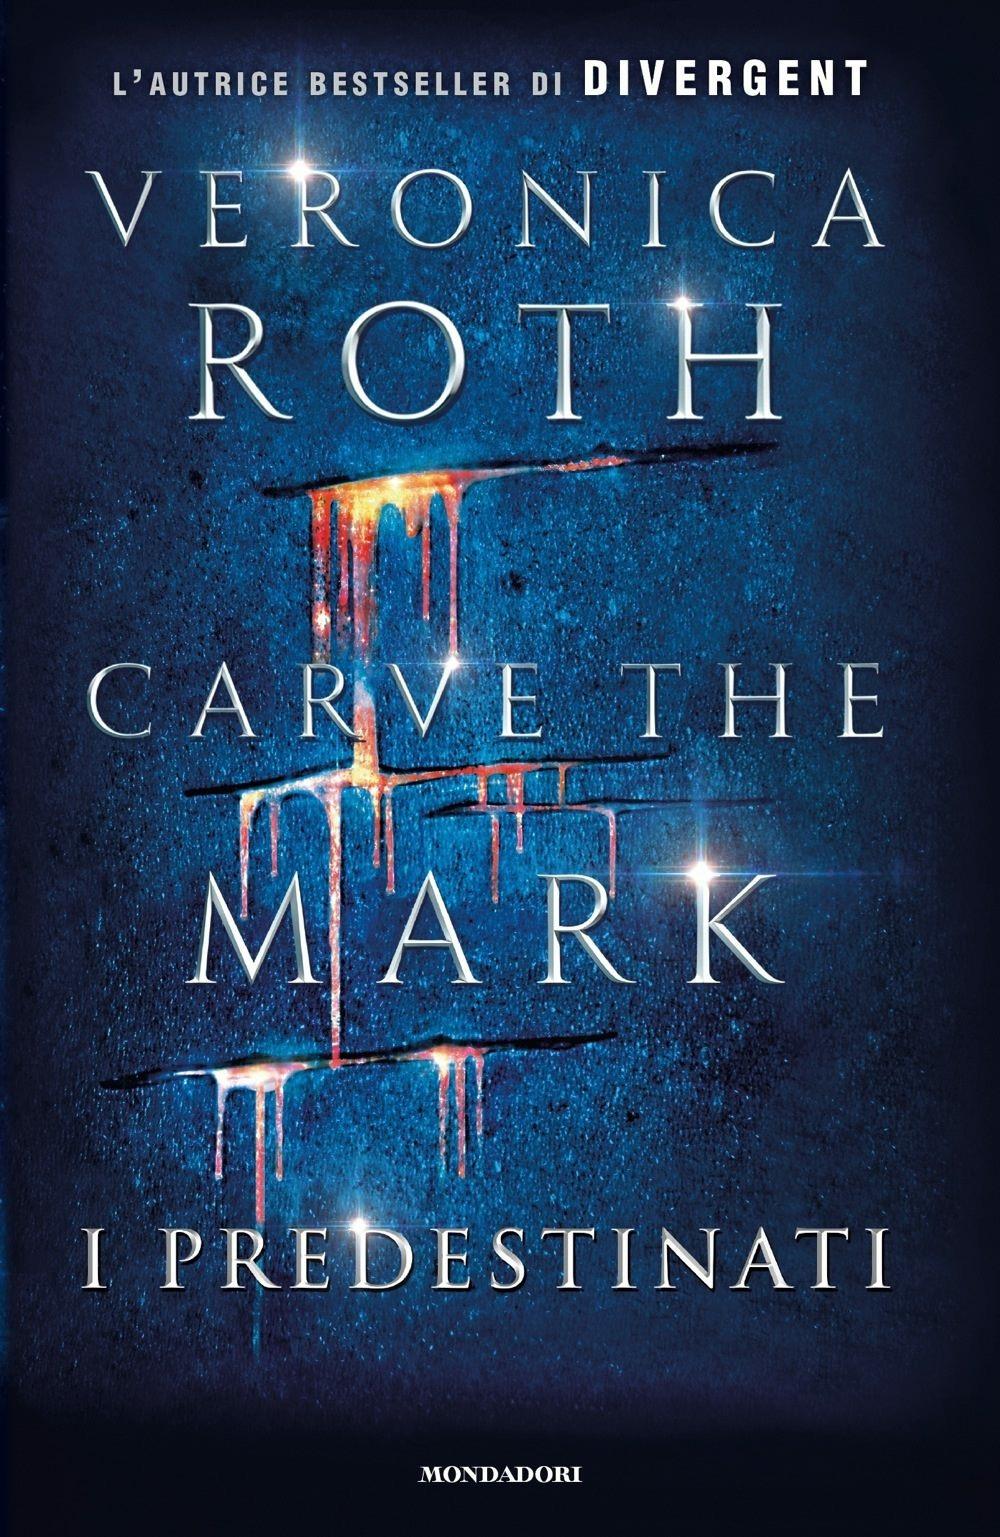 Carve the Mark. I pr...